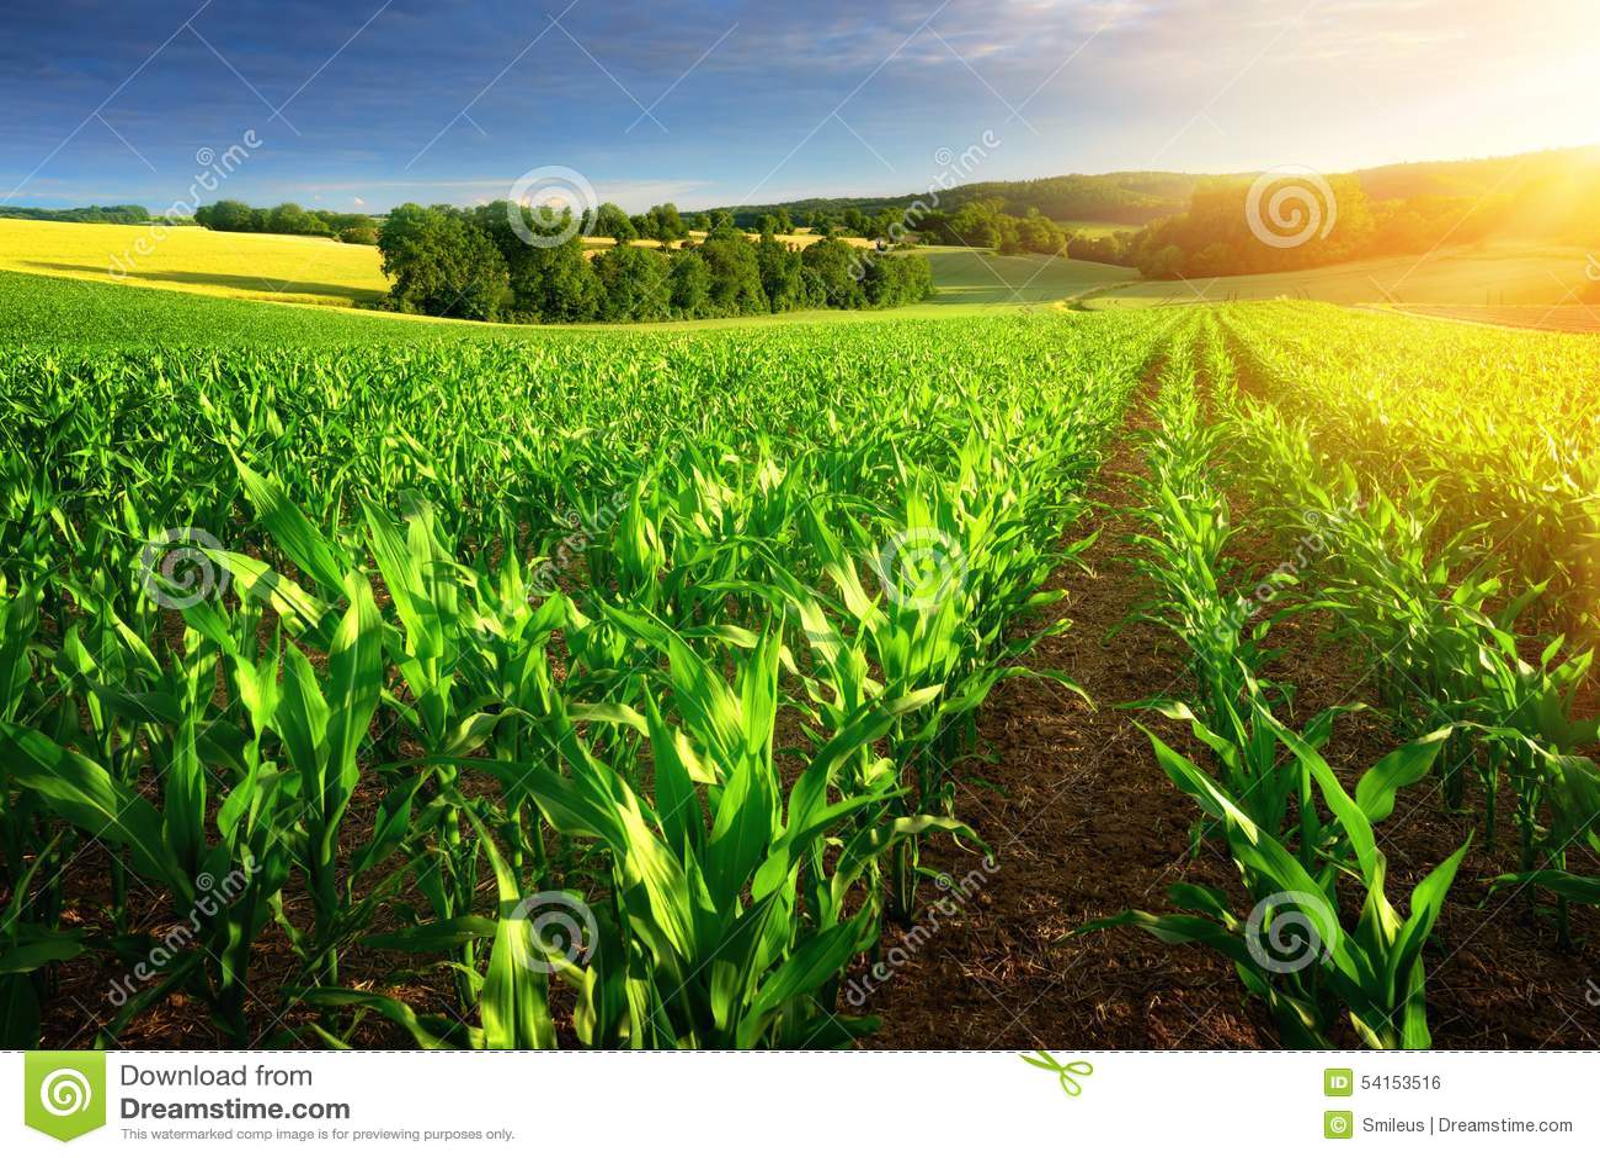 Sunlit rows of corn plants